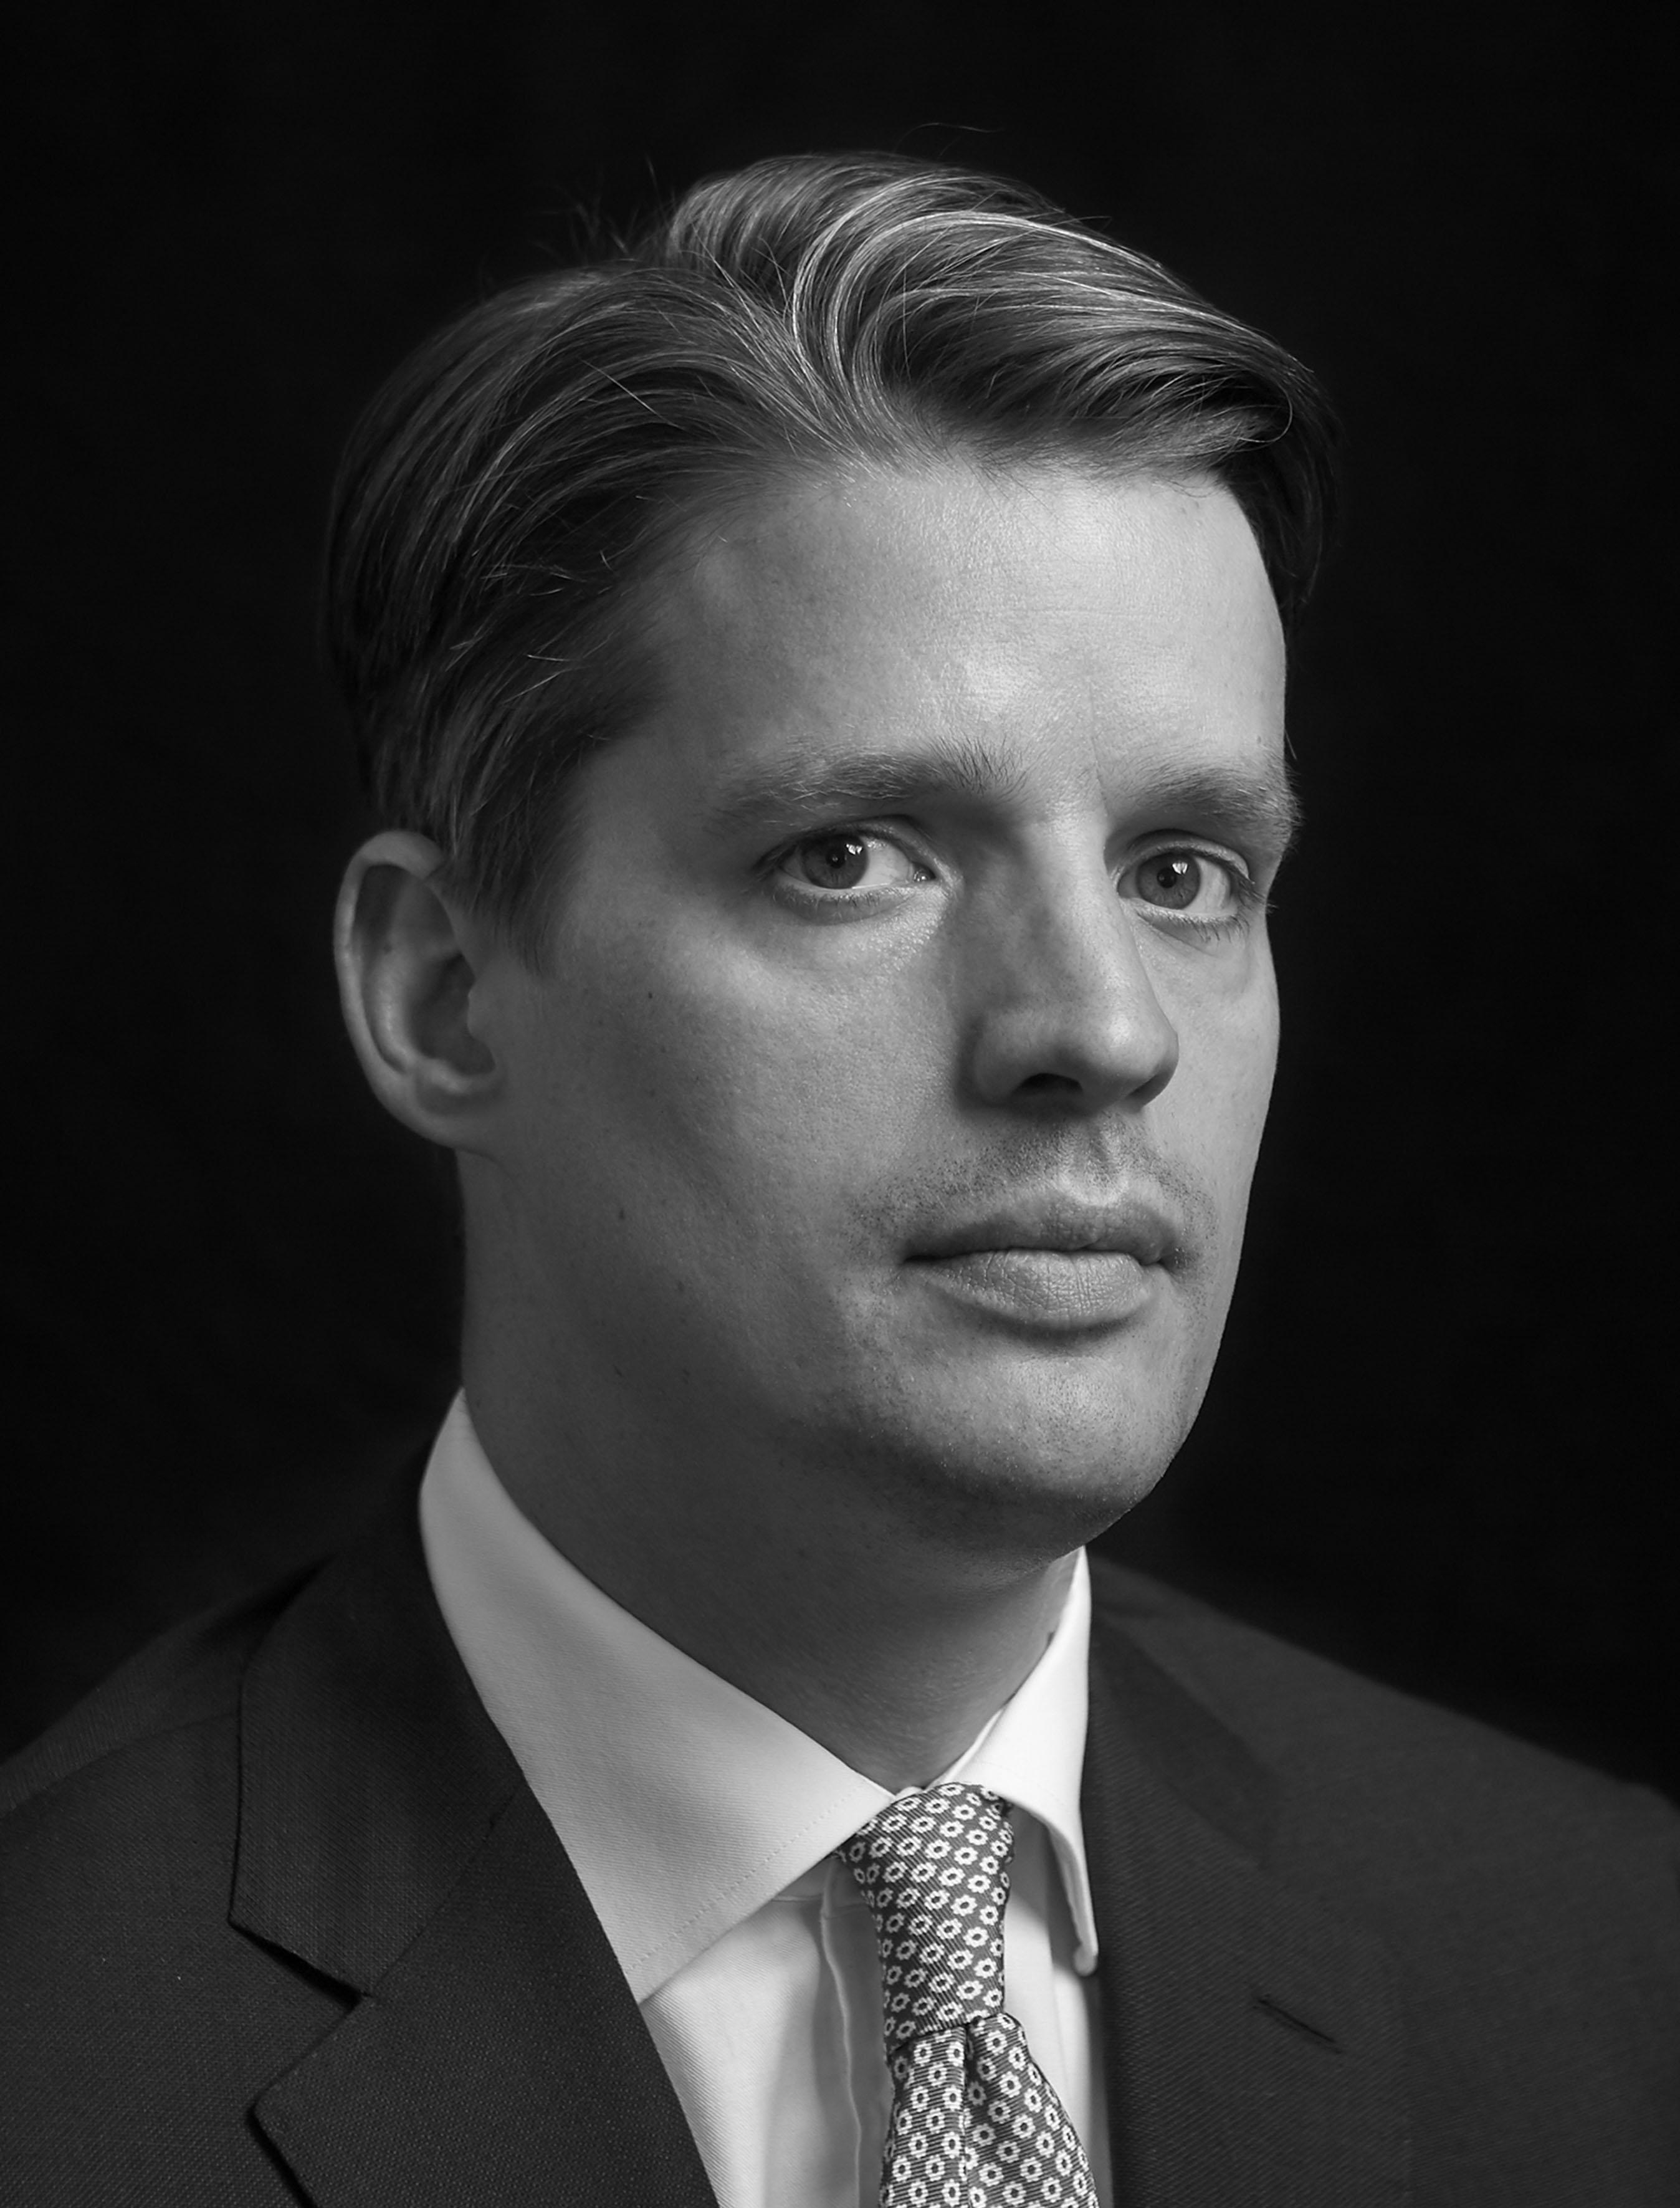 Dr. Kilian Jay von Seldeneck